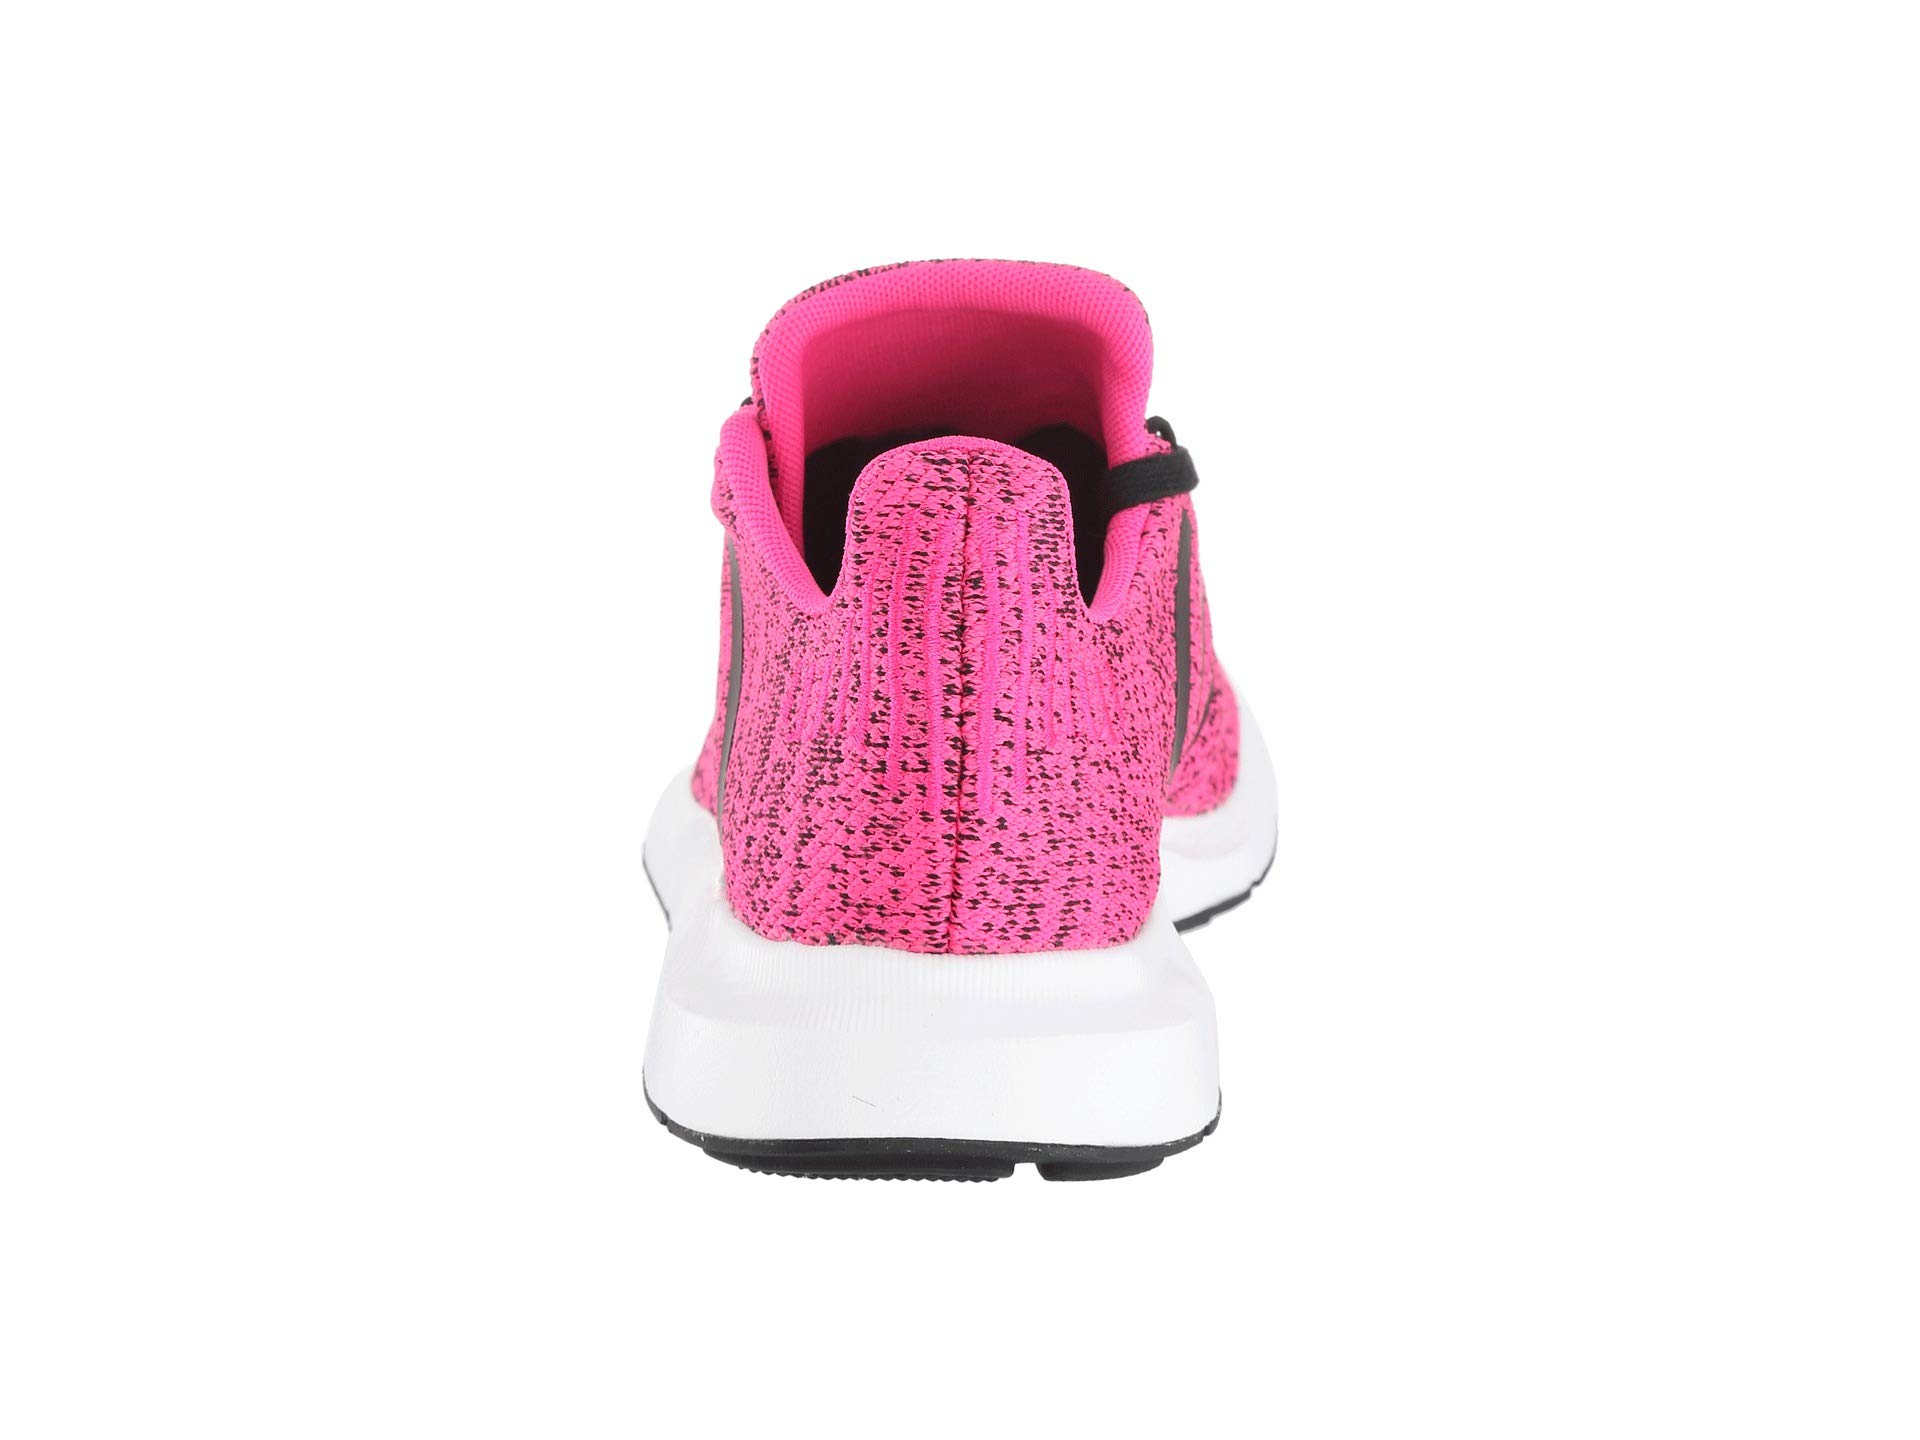 adidas Originals Kids Girl's Swift Run J (Big Kid) Shock Pink/Black 4.5 M US Big Kid by adidas Originals (Image #3)